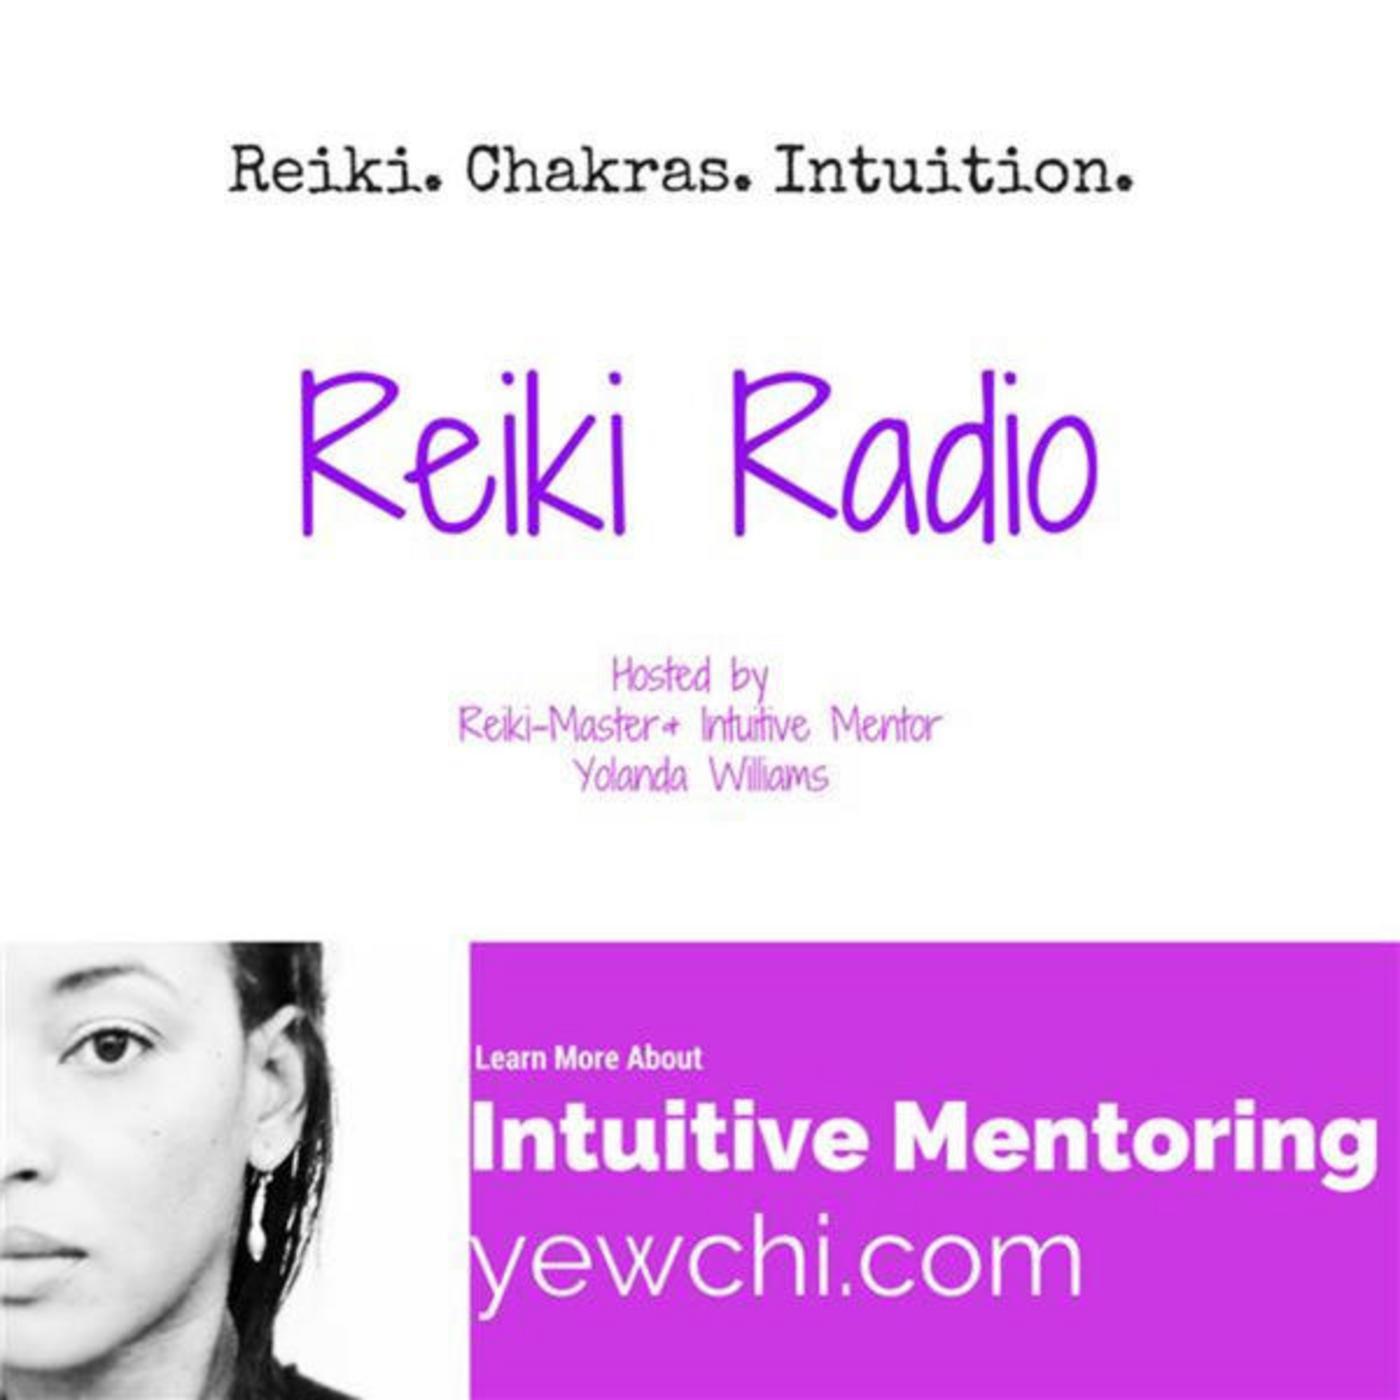 Reiki Radio: Prosperity and Abundance